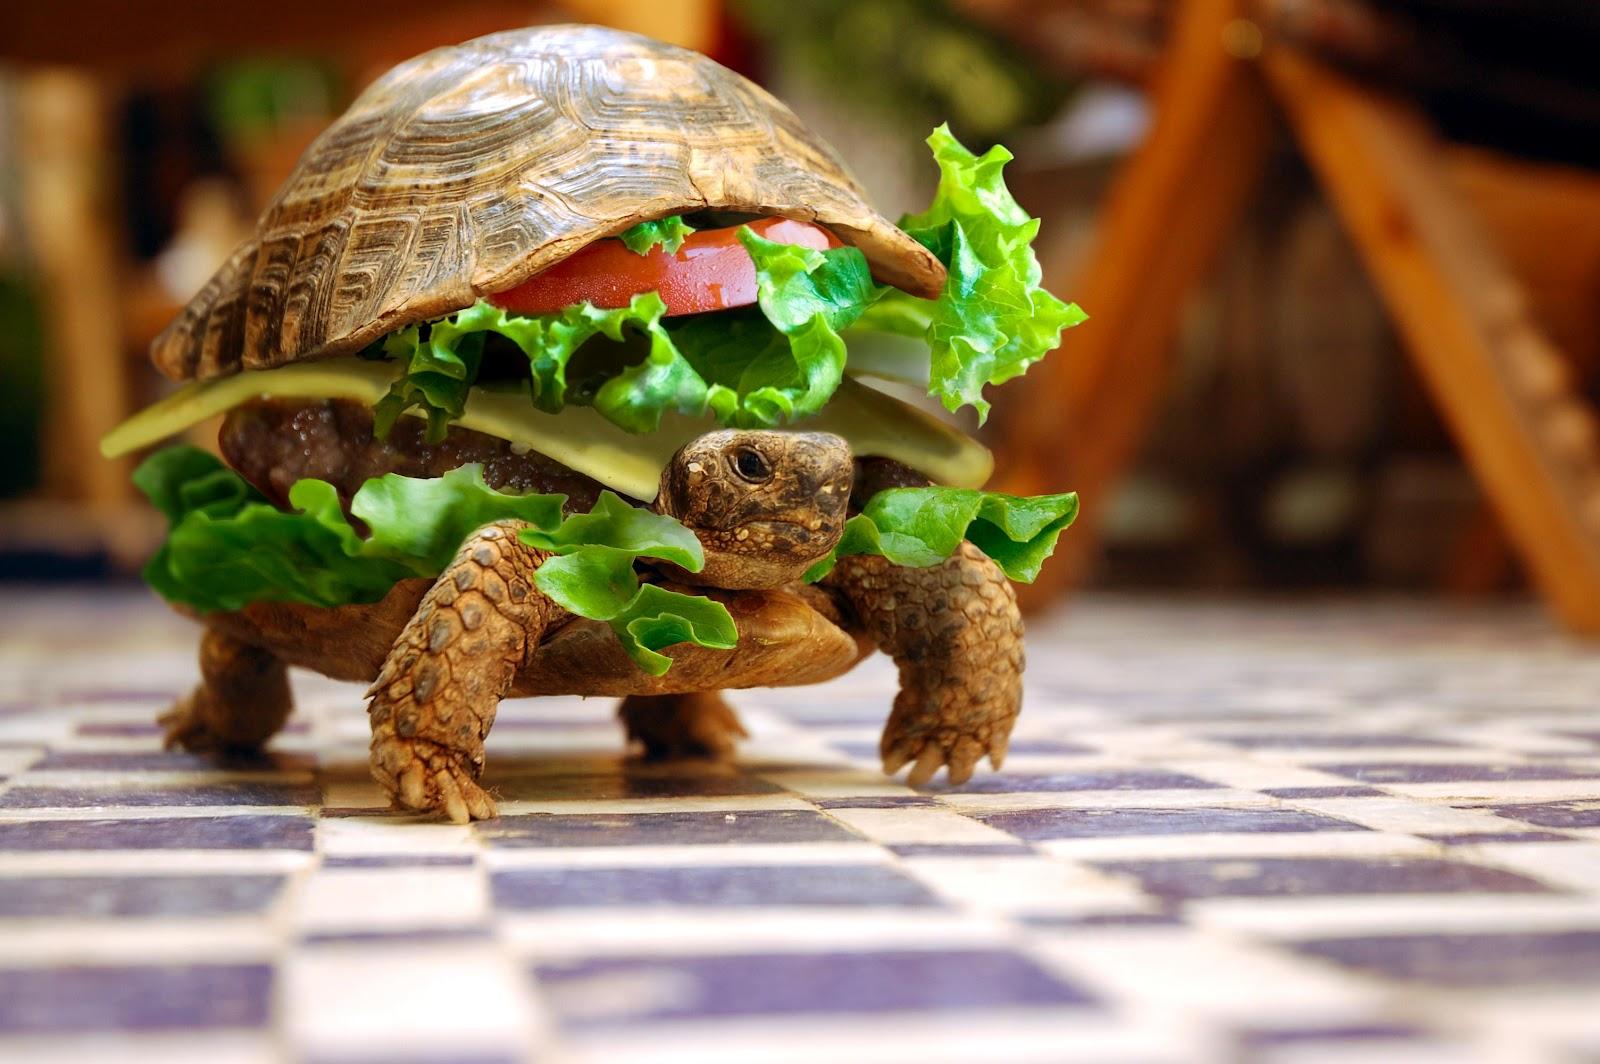 Tortuga hamburguesa divertida